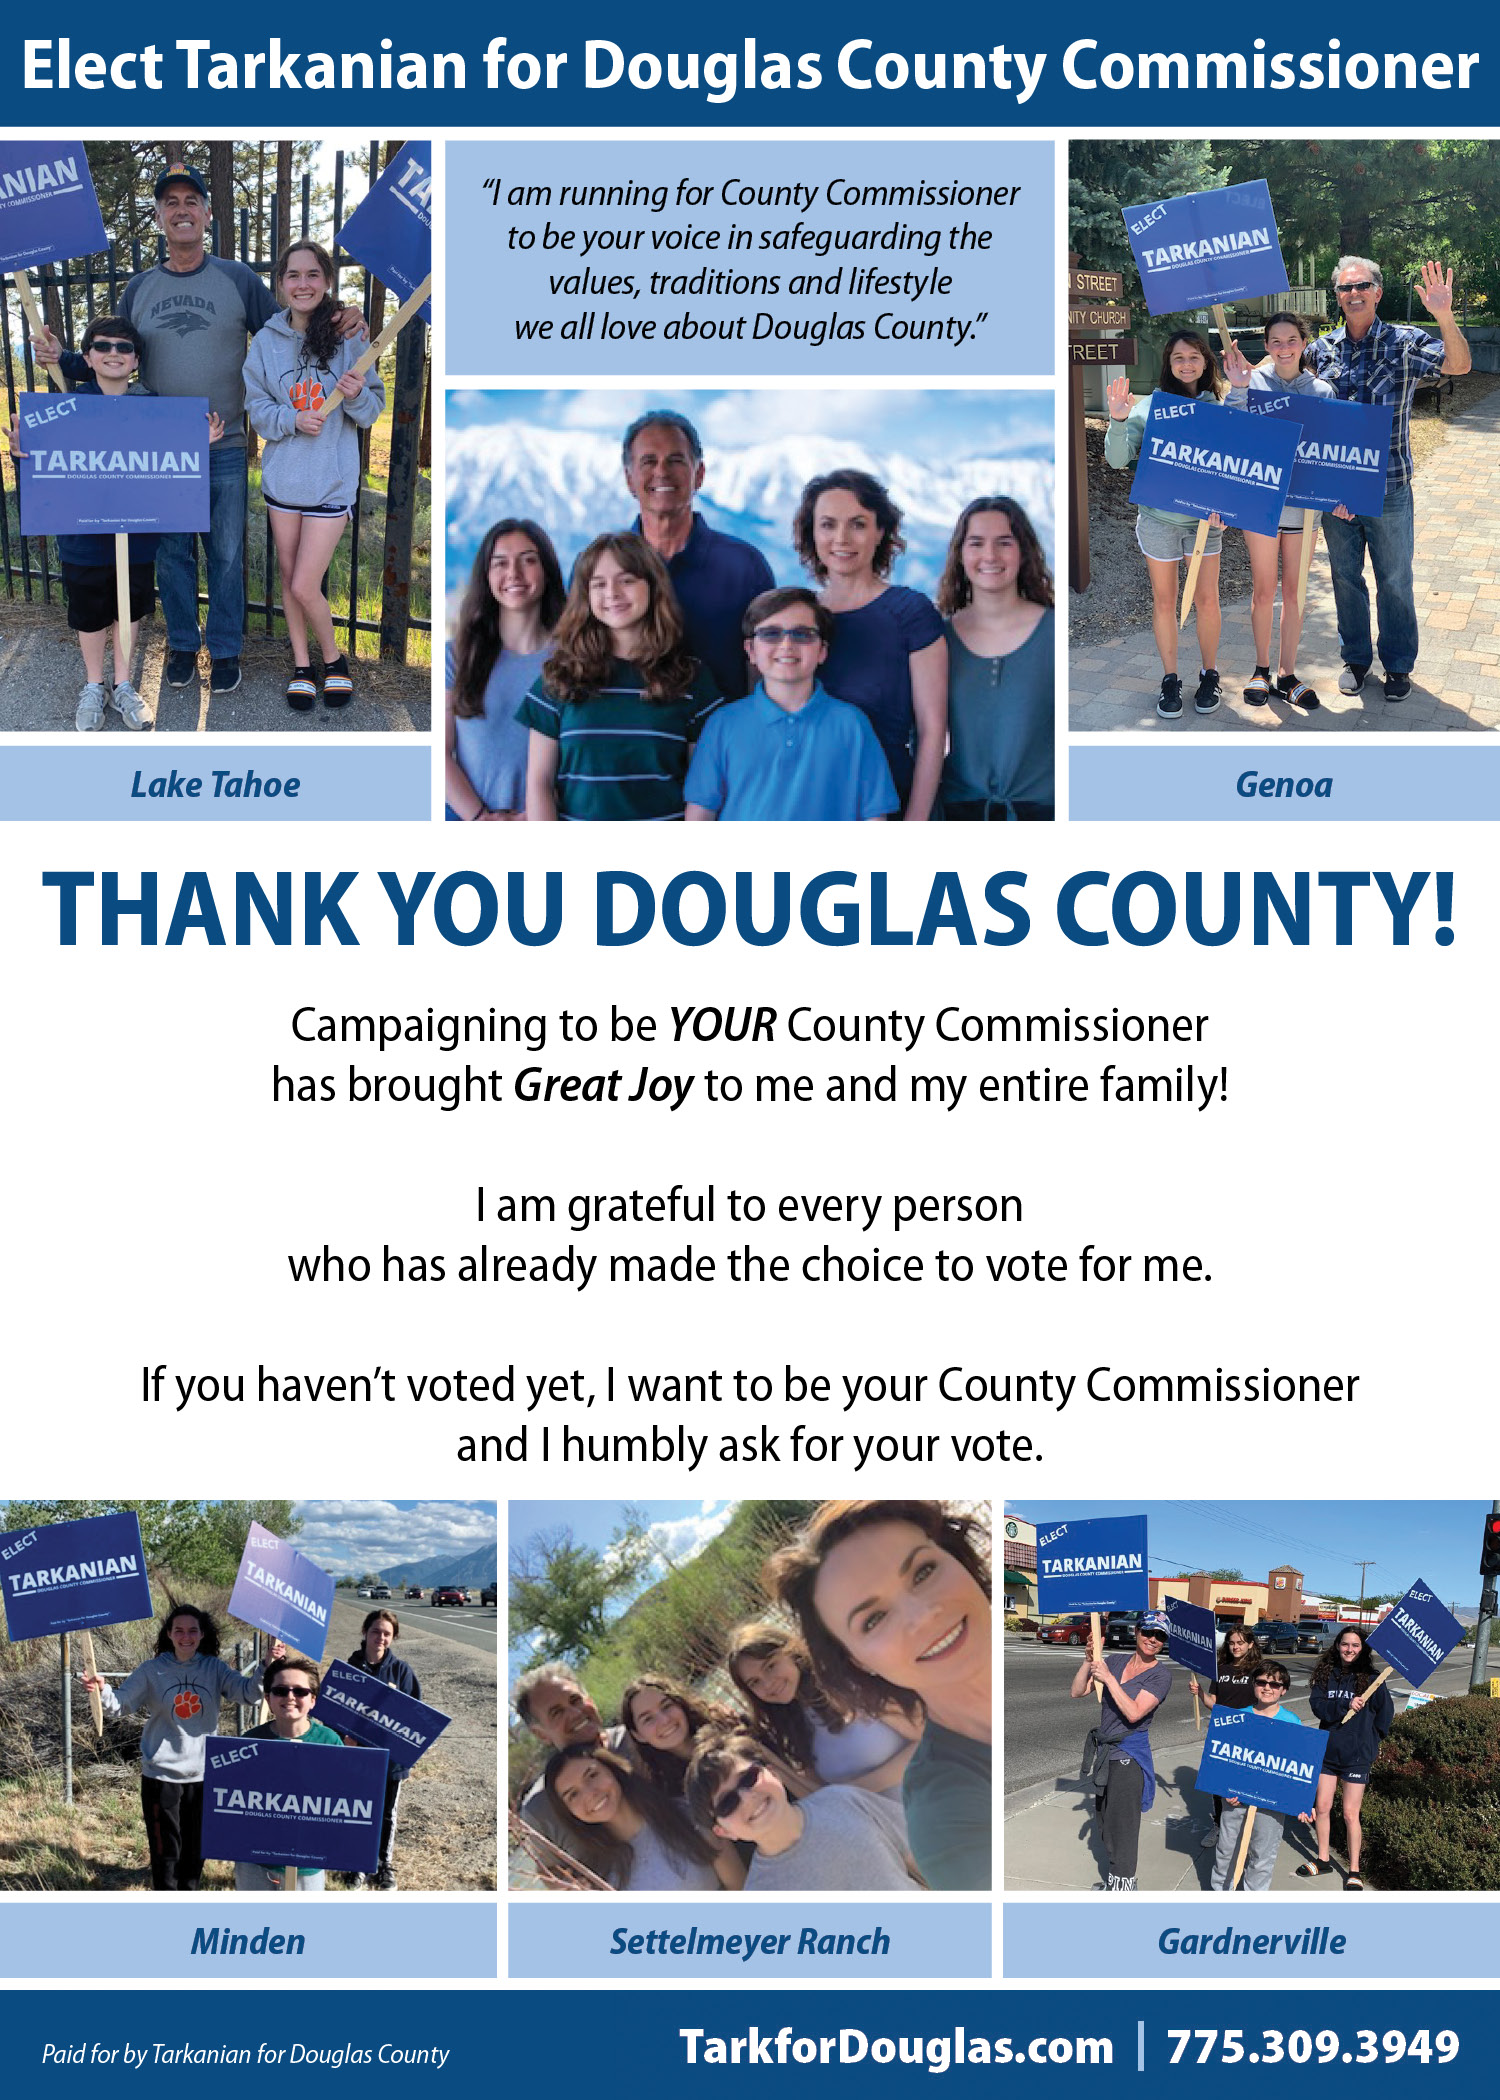 Thank You Douglas County!